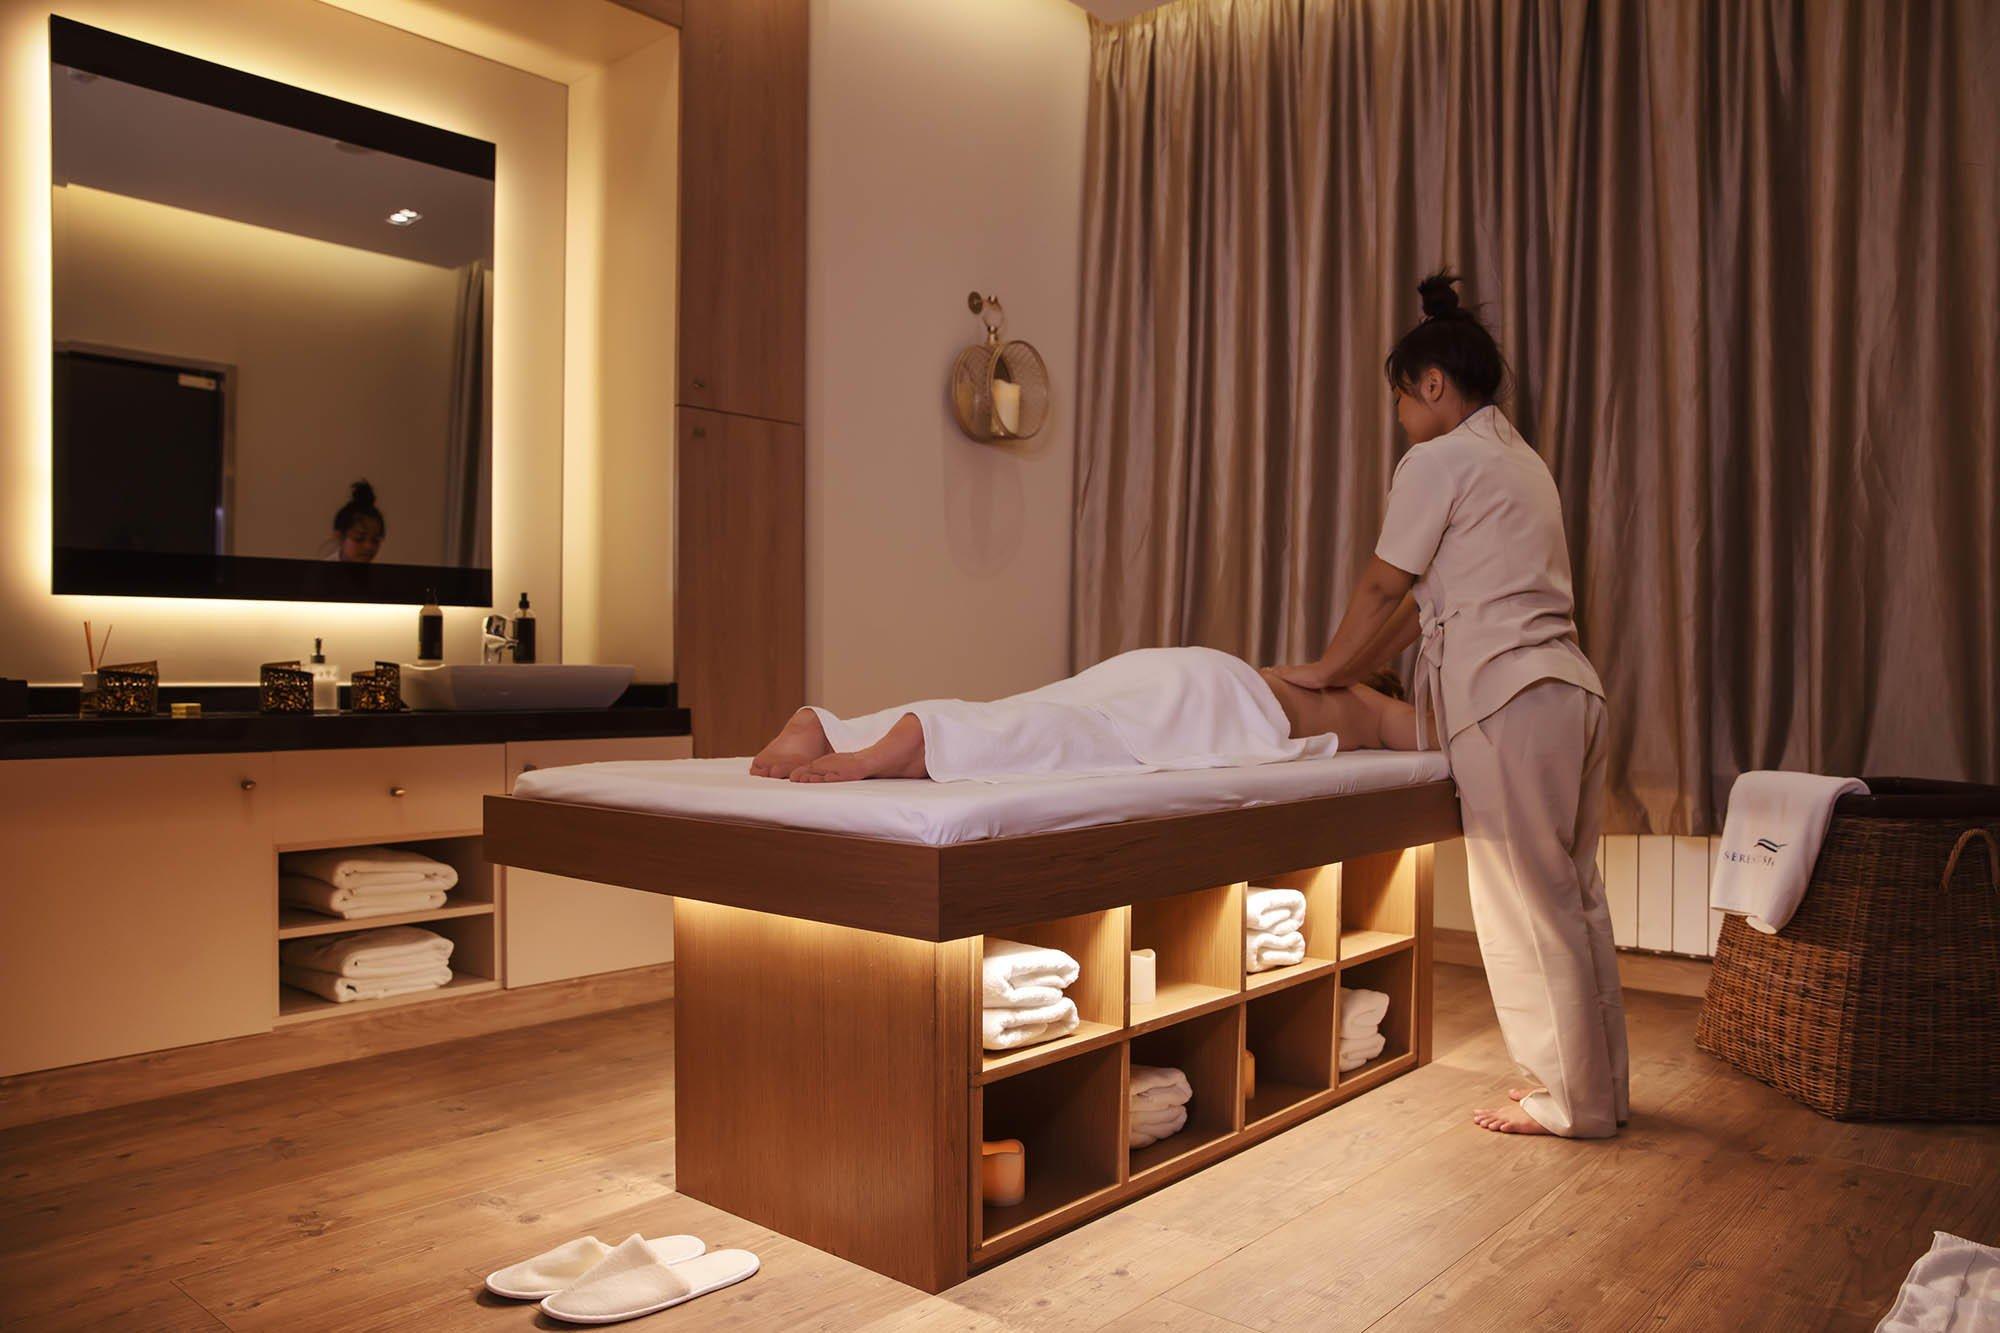 Spa Treatment at Mist Hotel